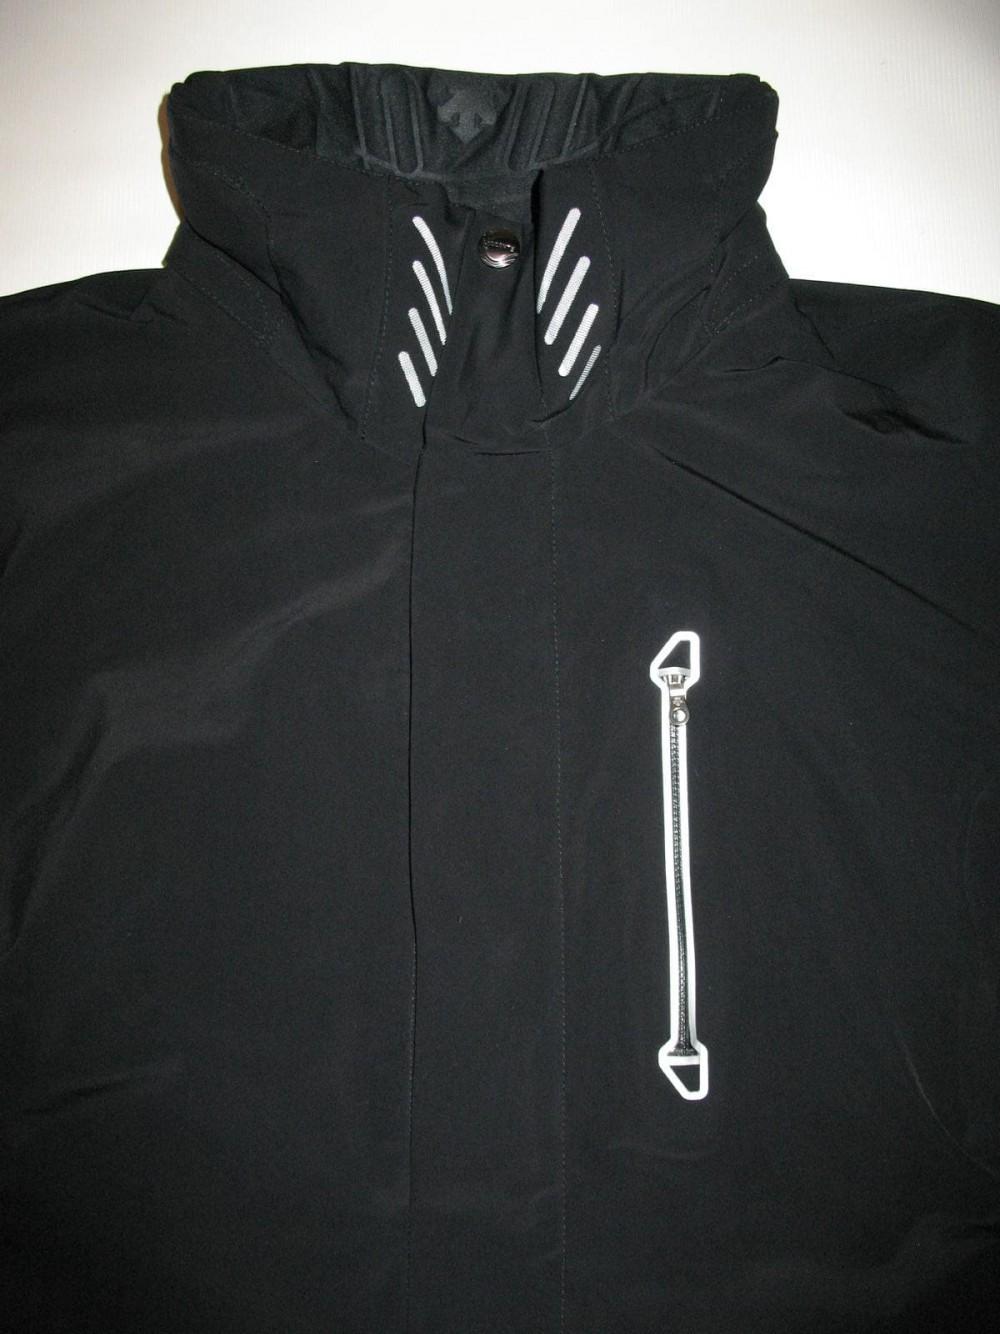 Куртка DESCENTE swiss olympic ski jacket (размер 54/XL) - 4